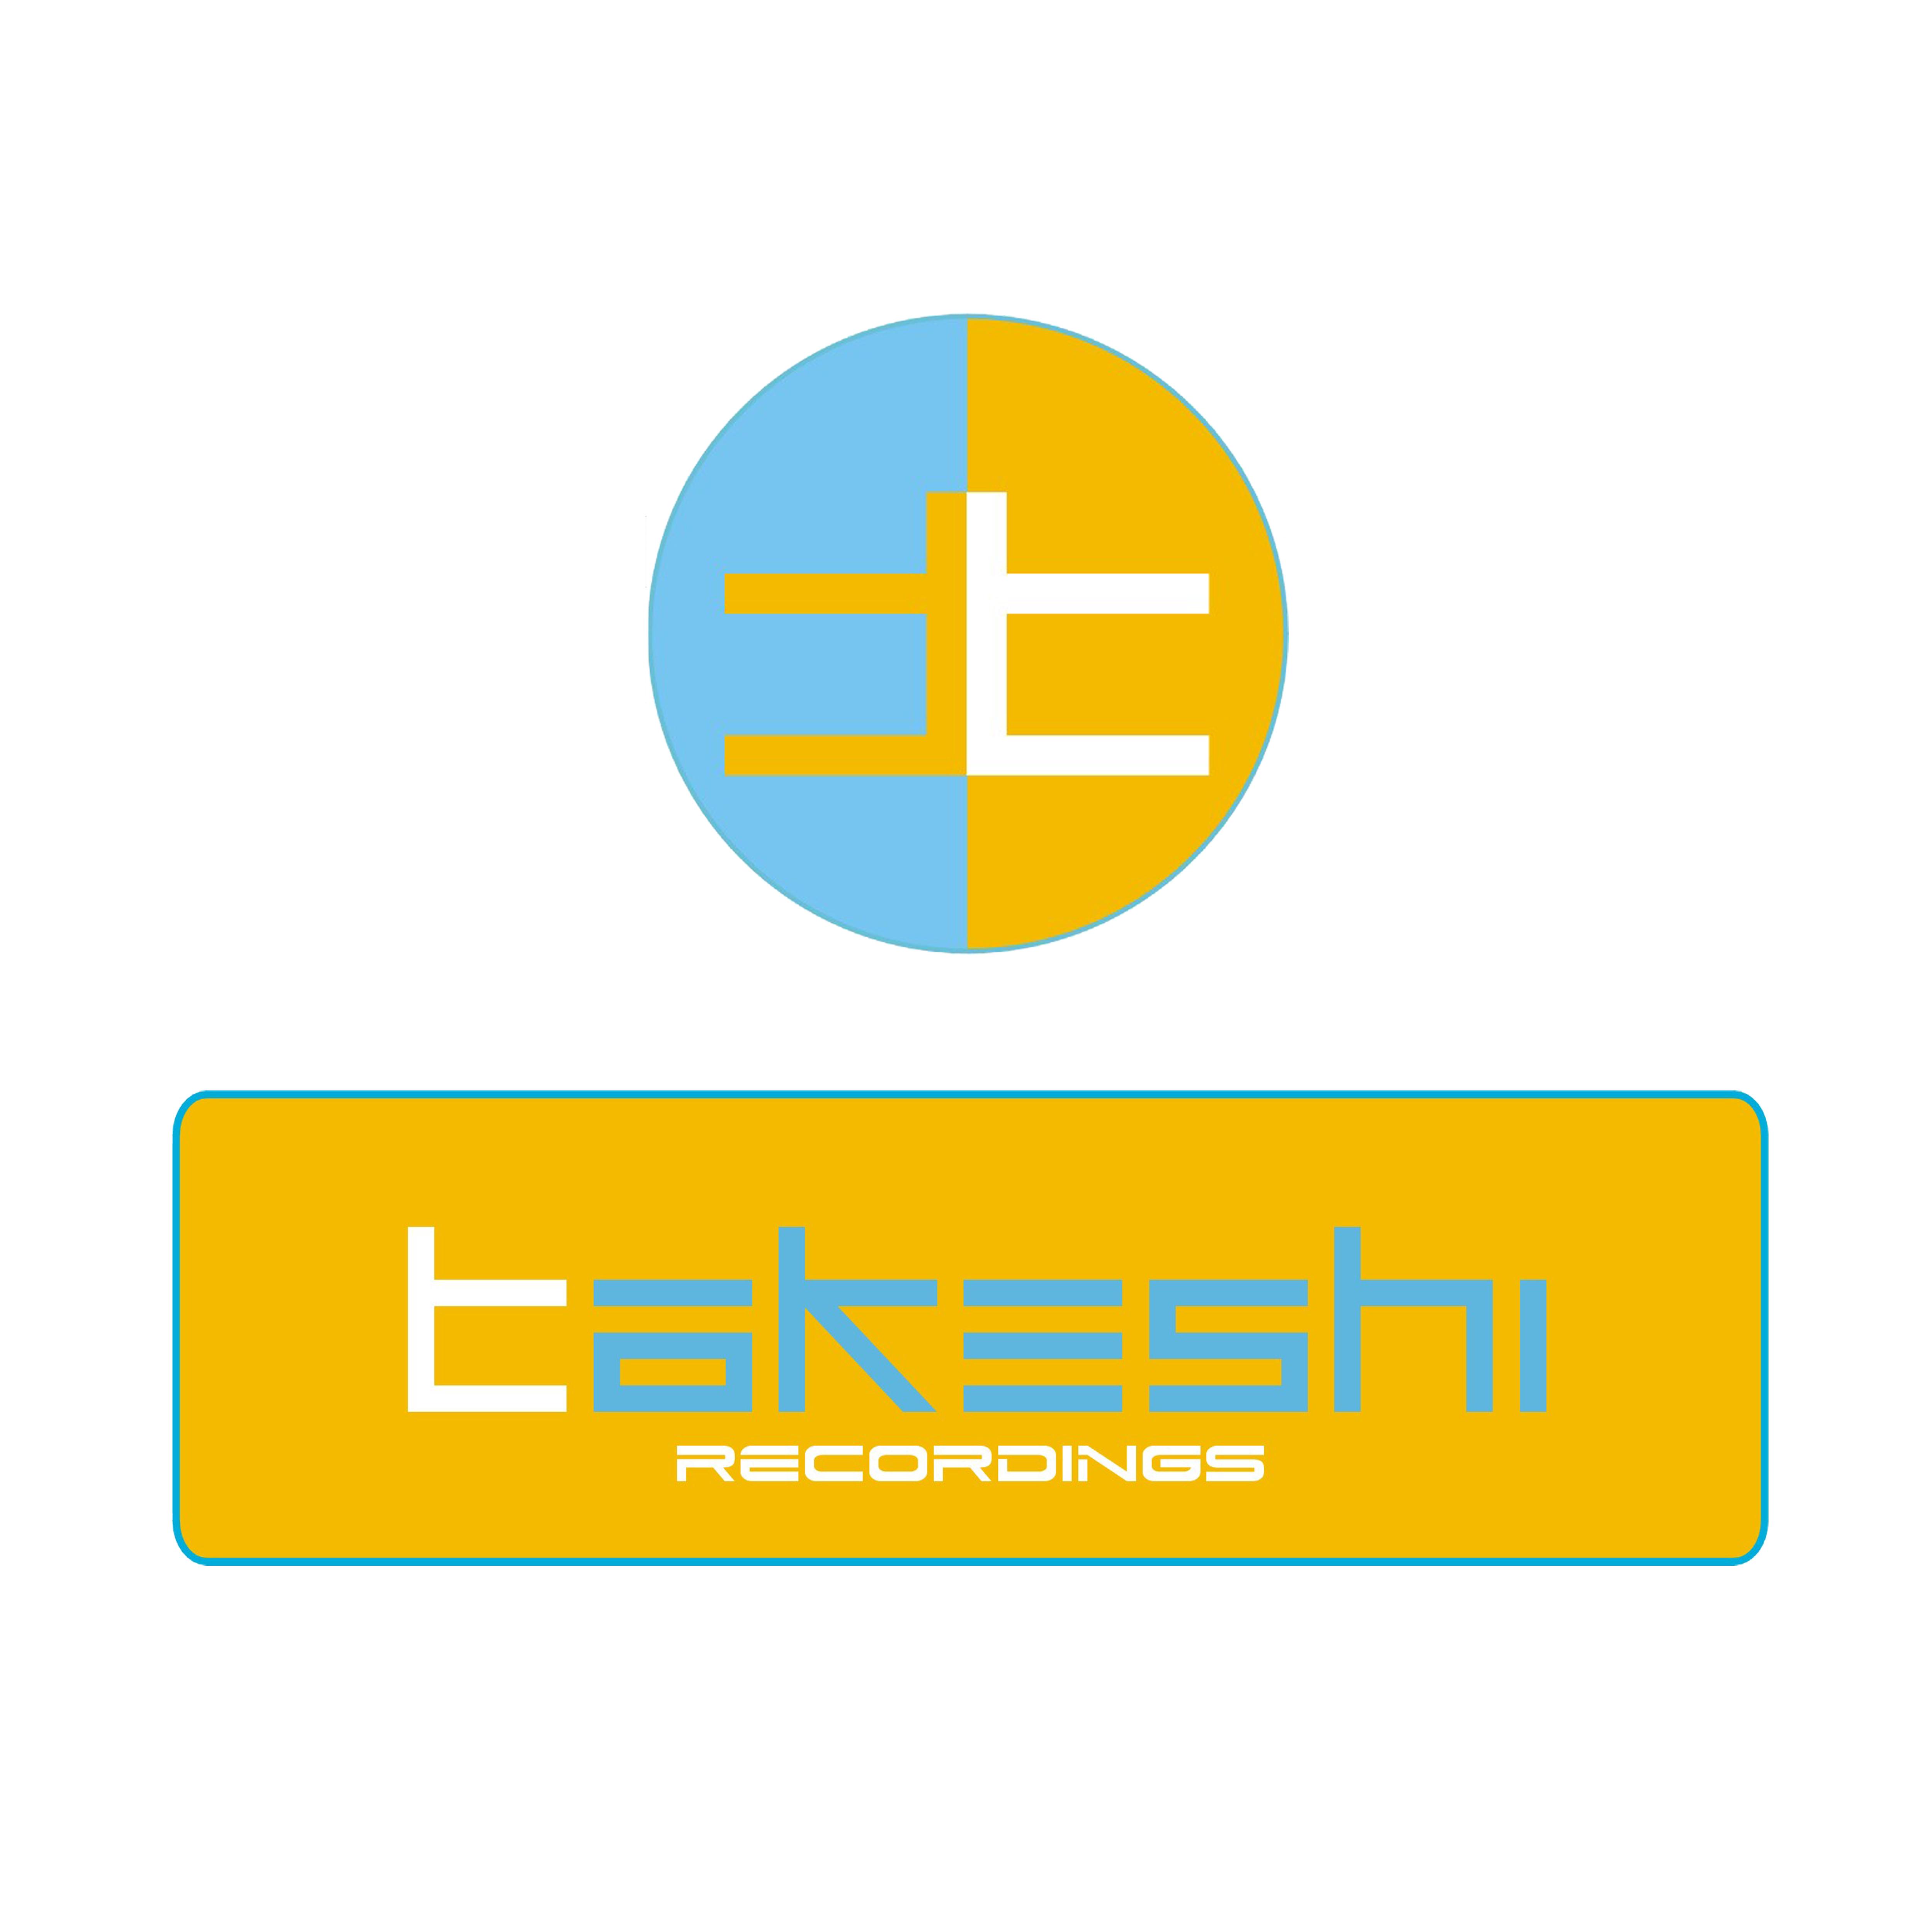 Takeshi Recordings